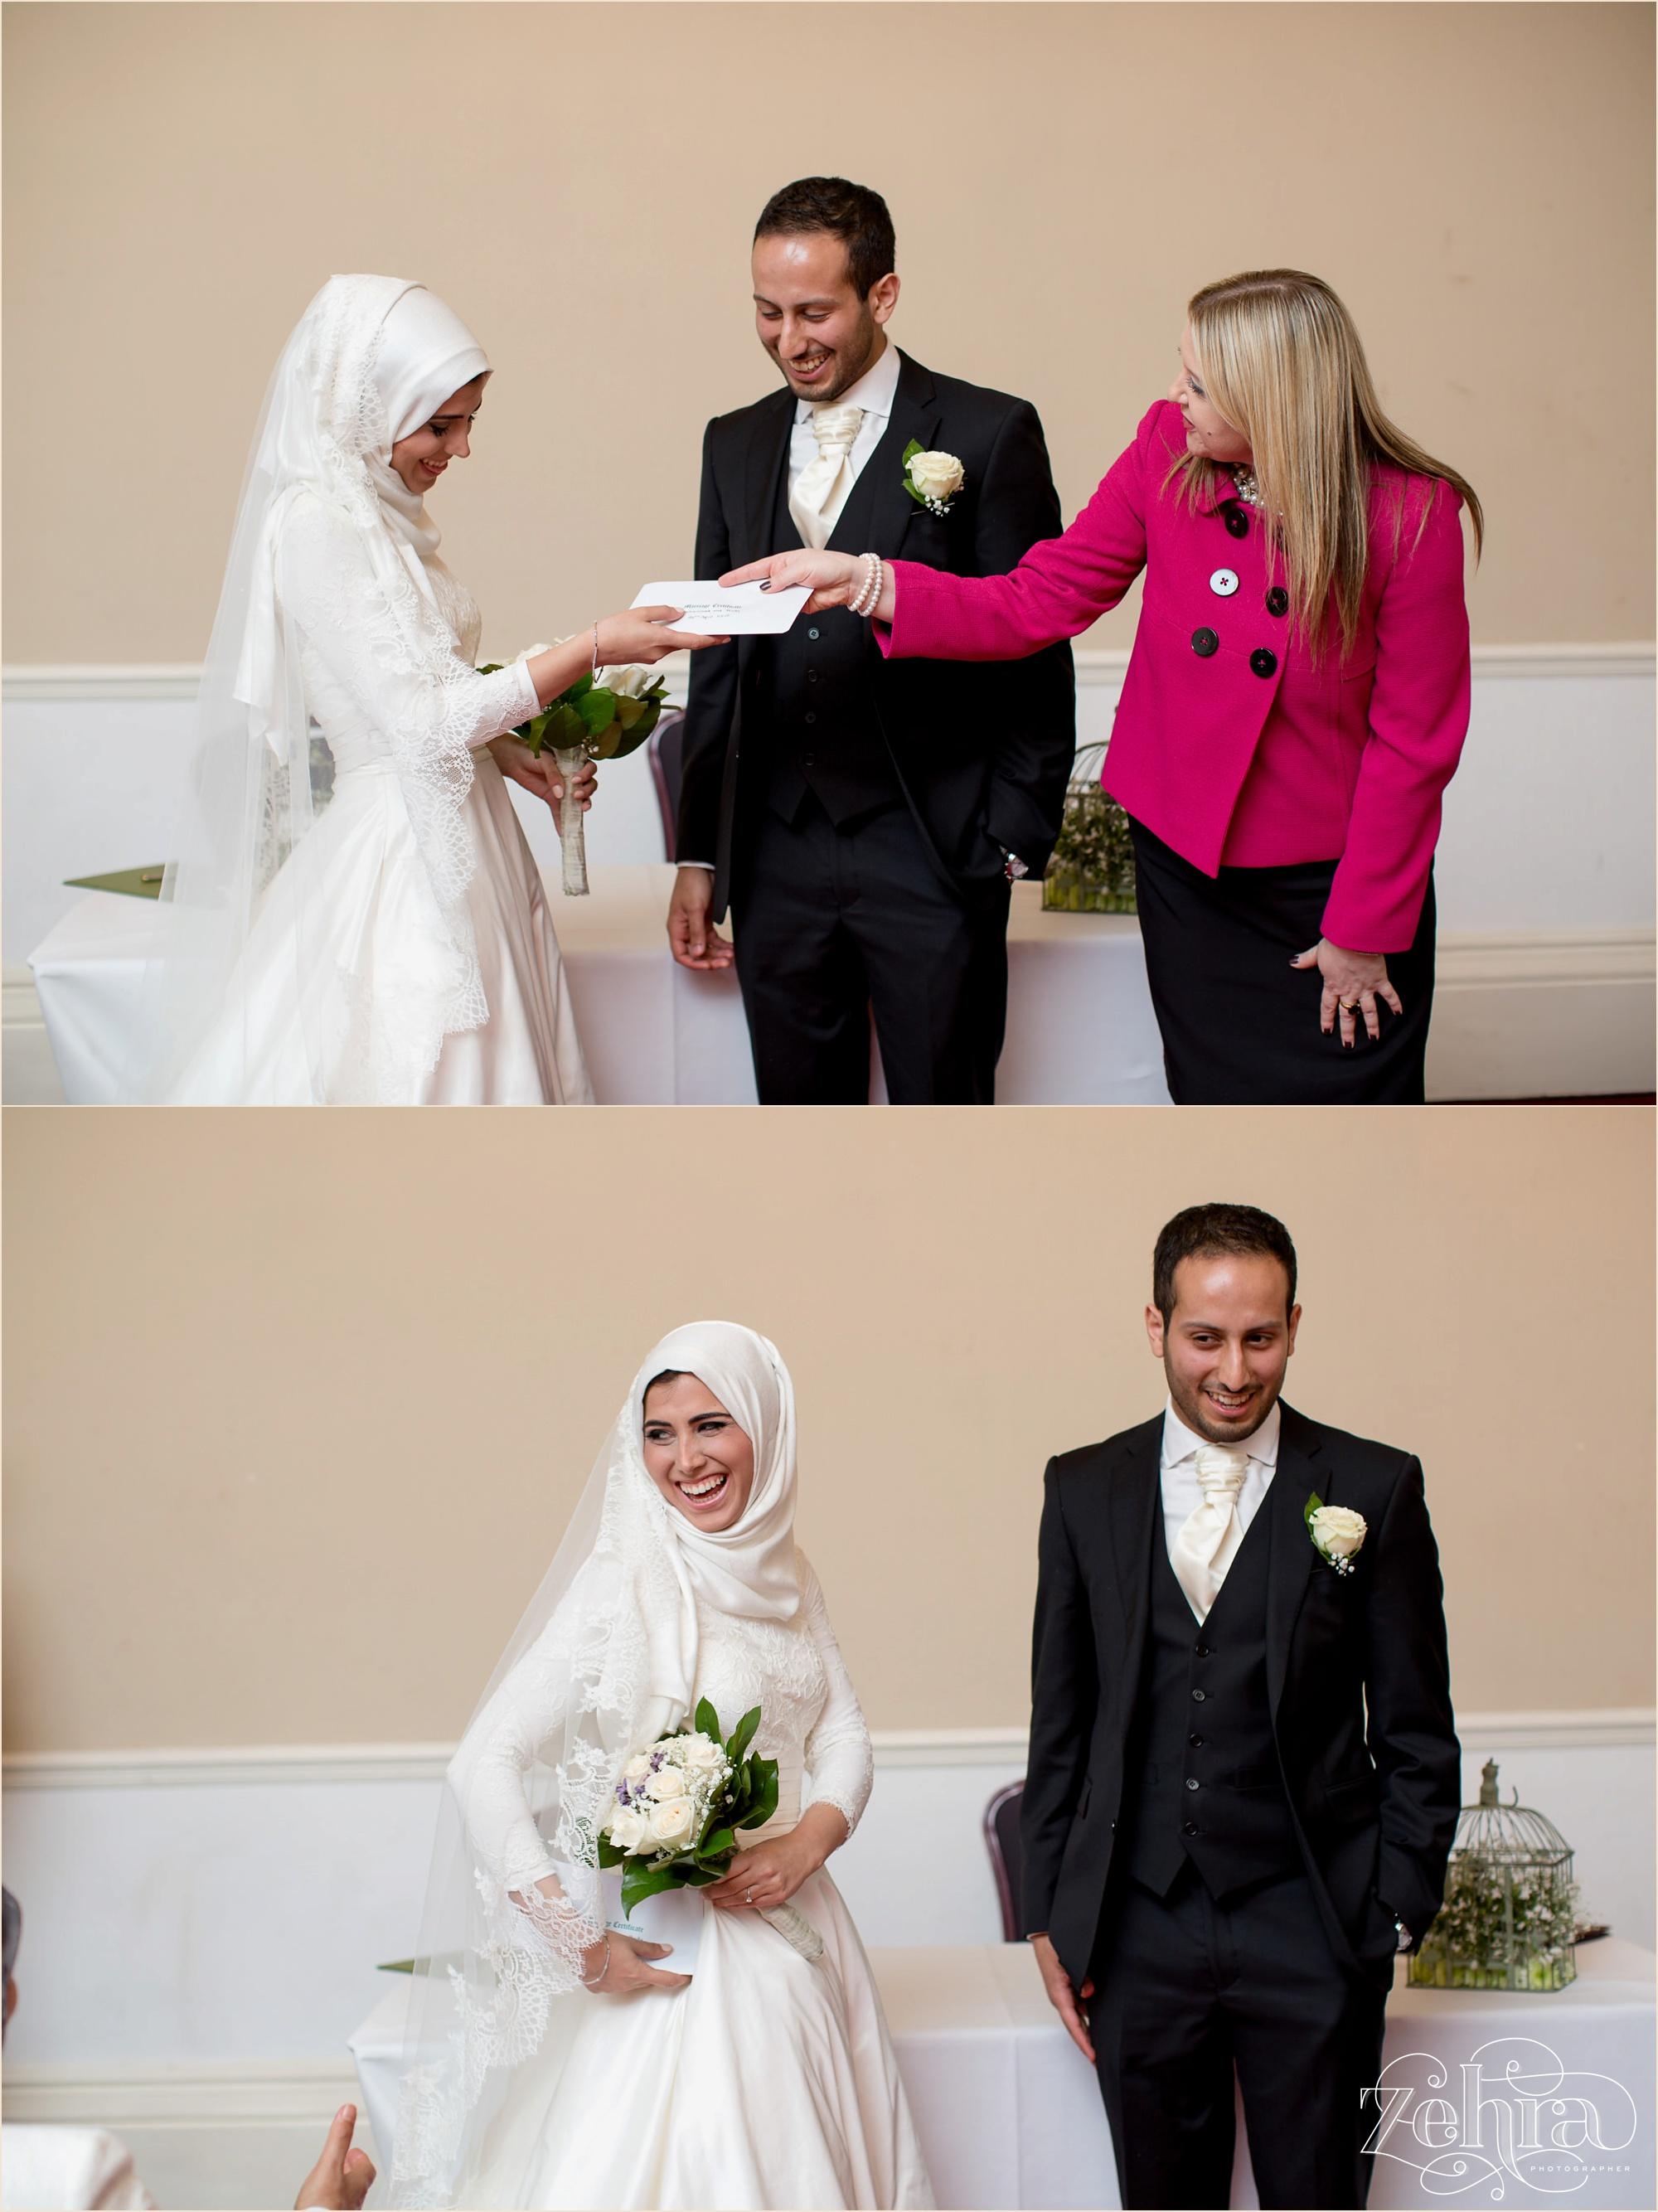 jasira manchester wedding photographer_0079.jpg